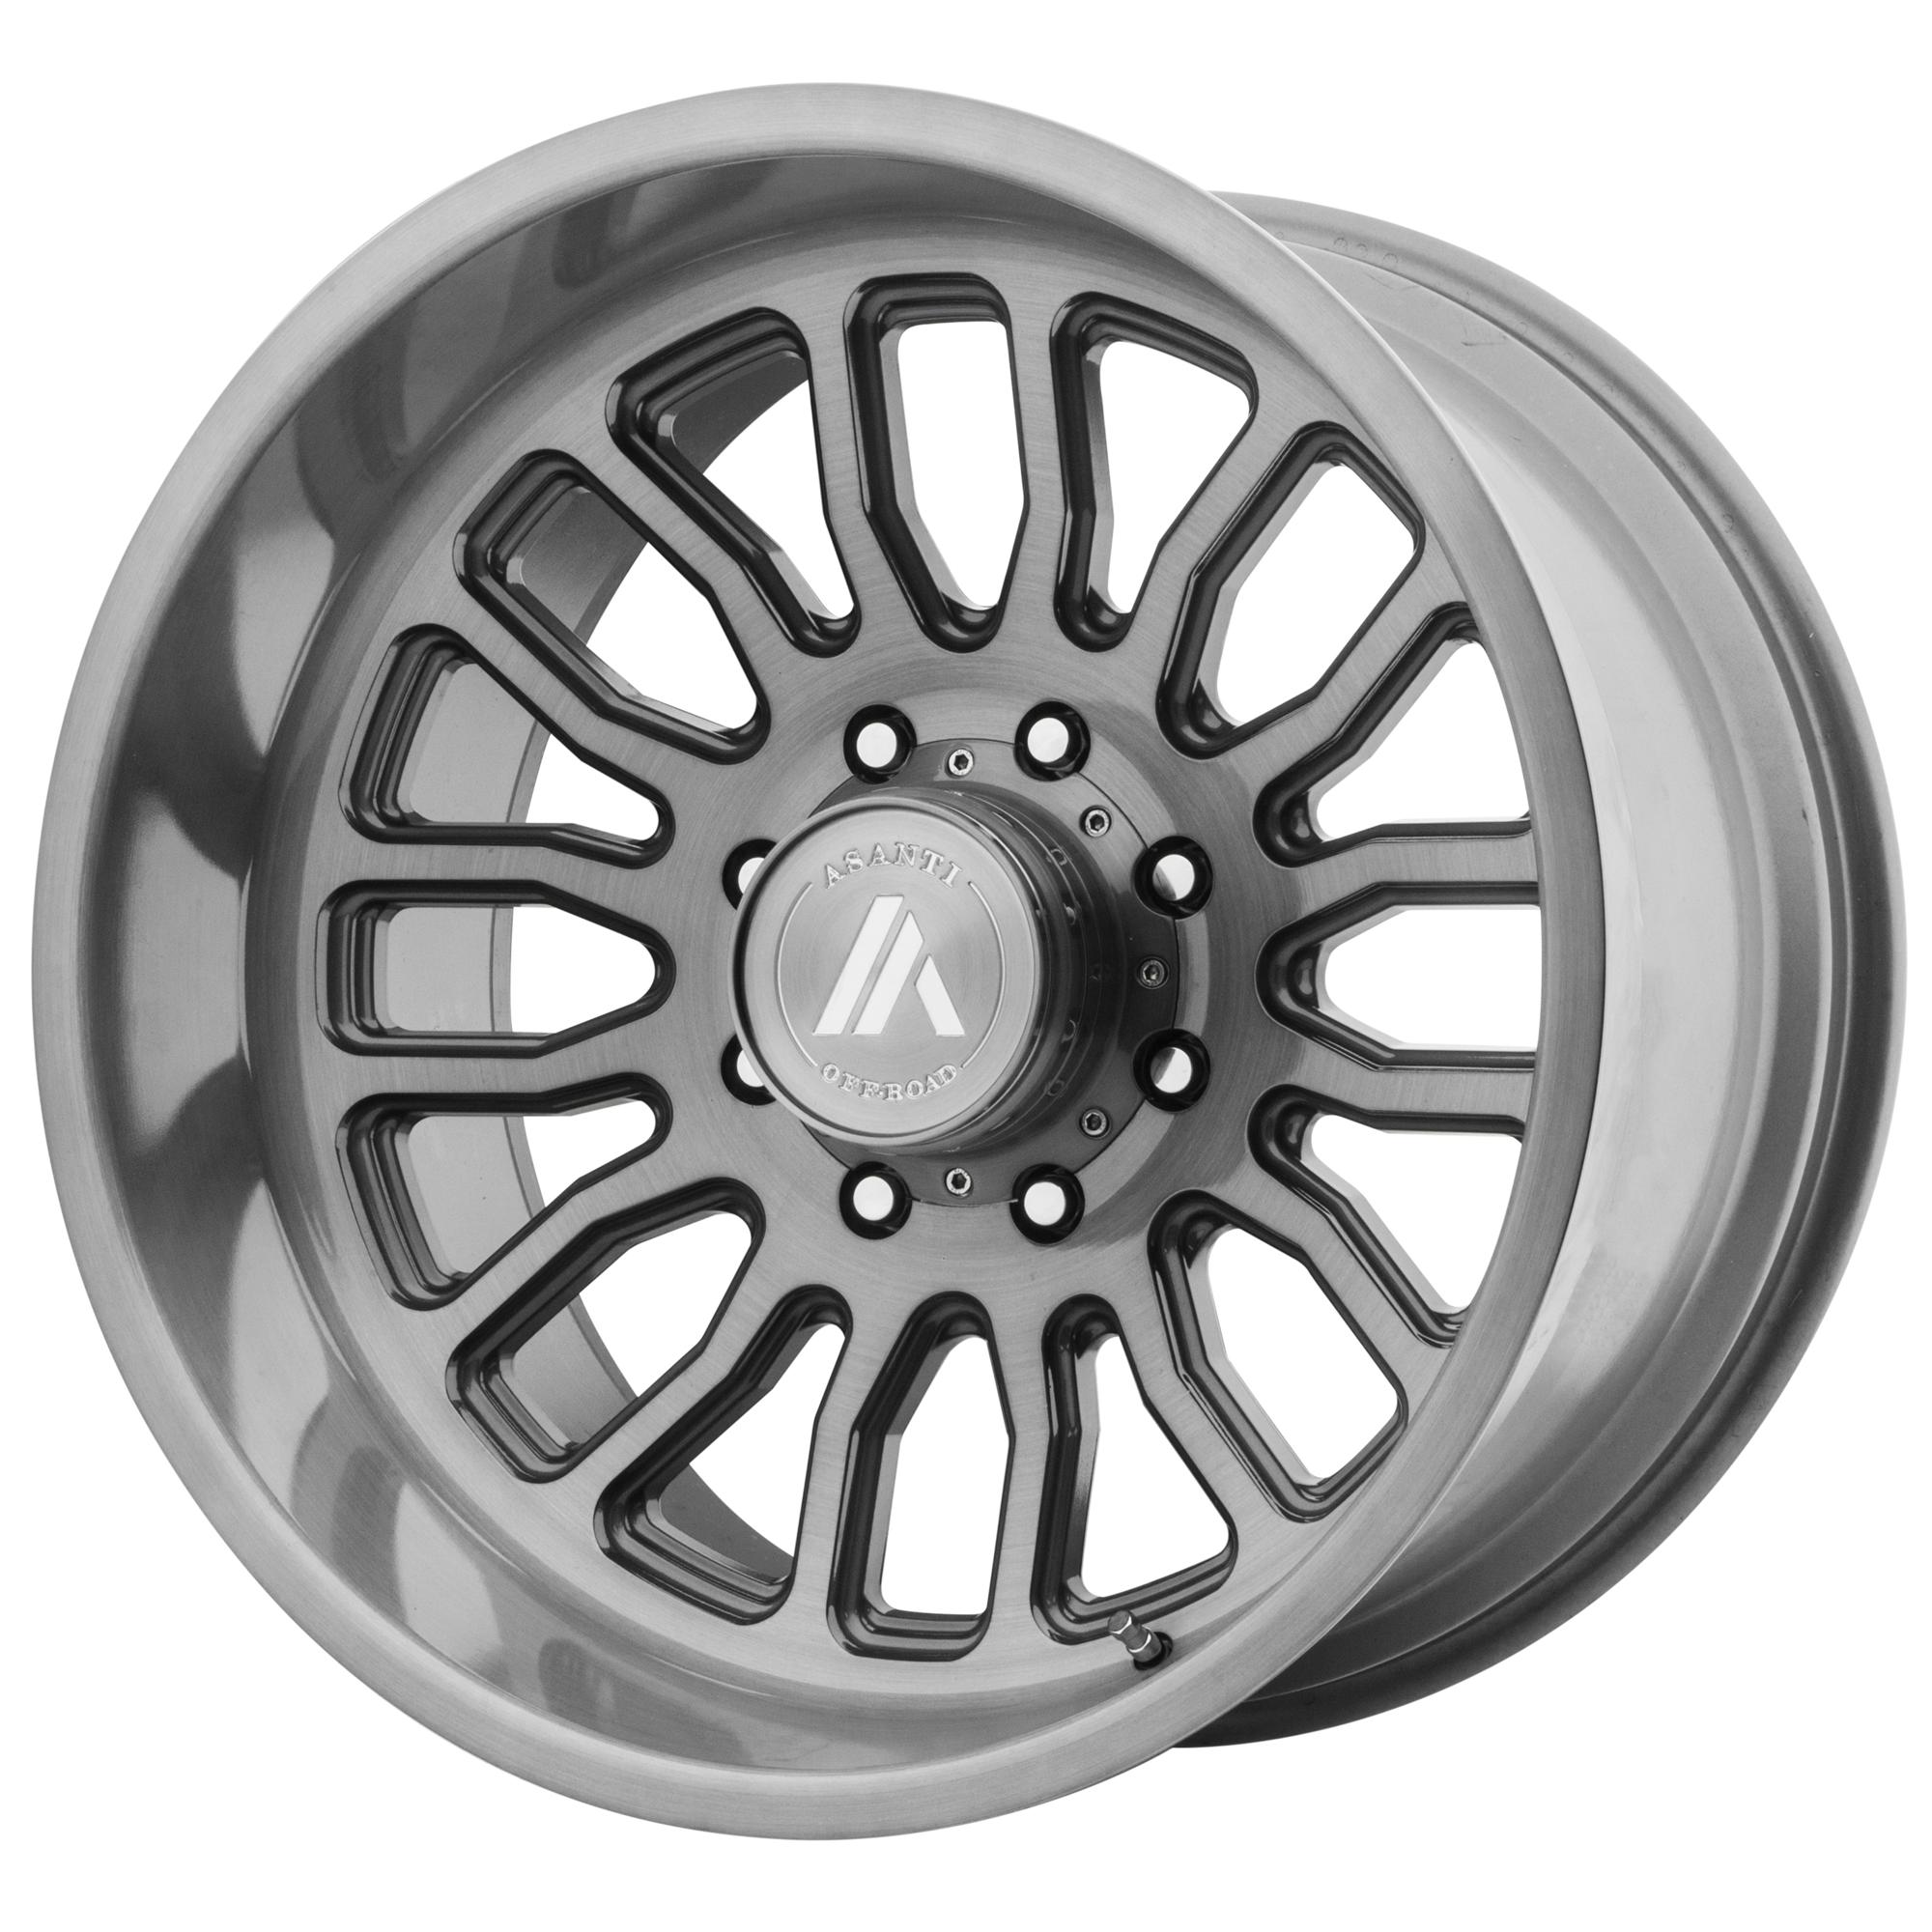 ASANTI OFF ROAD AB815 WORKHORSE hliníkové disky 12x22 8x165,1 ET-40 Titanium-Brushed